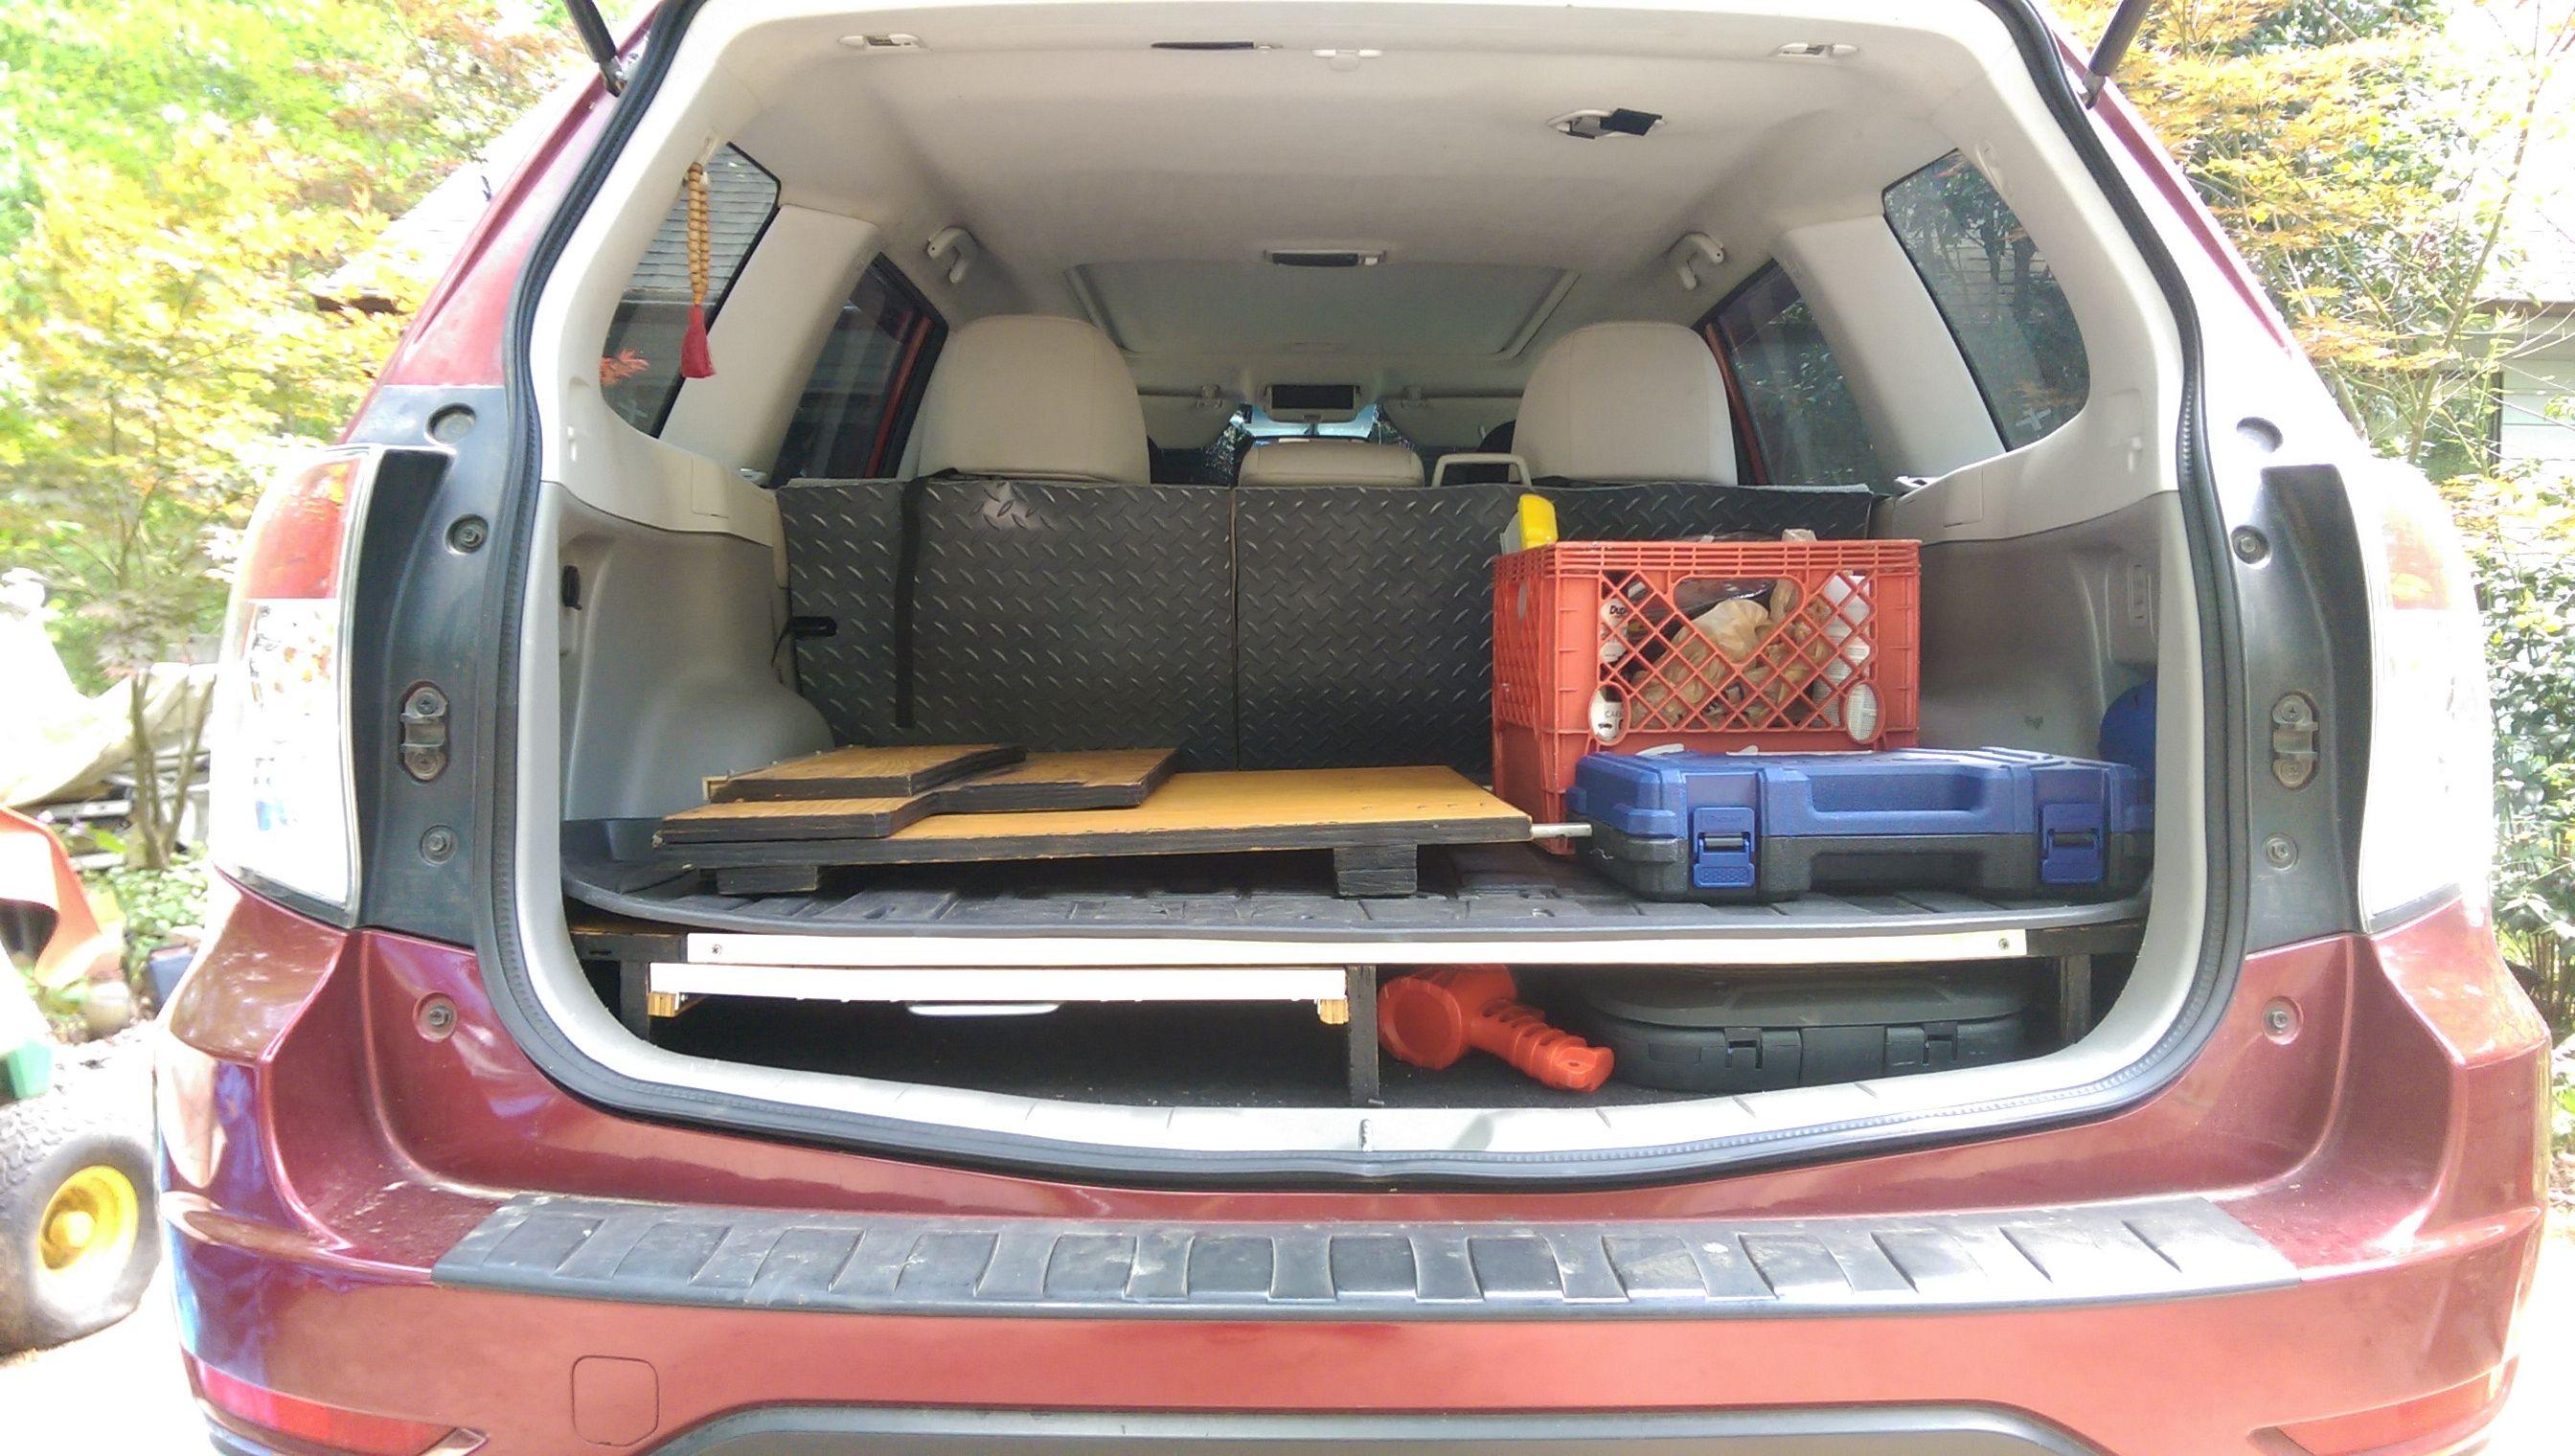 09 13 Rear Sleeping Platform Subaru Forester Owners Forum